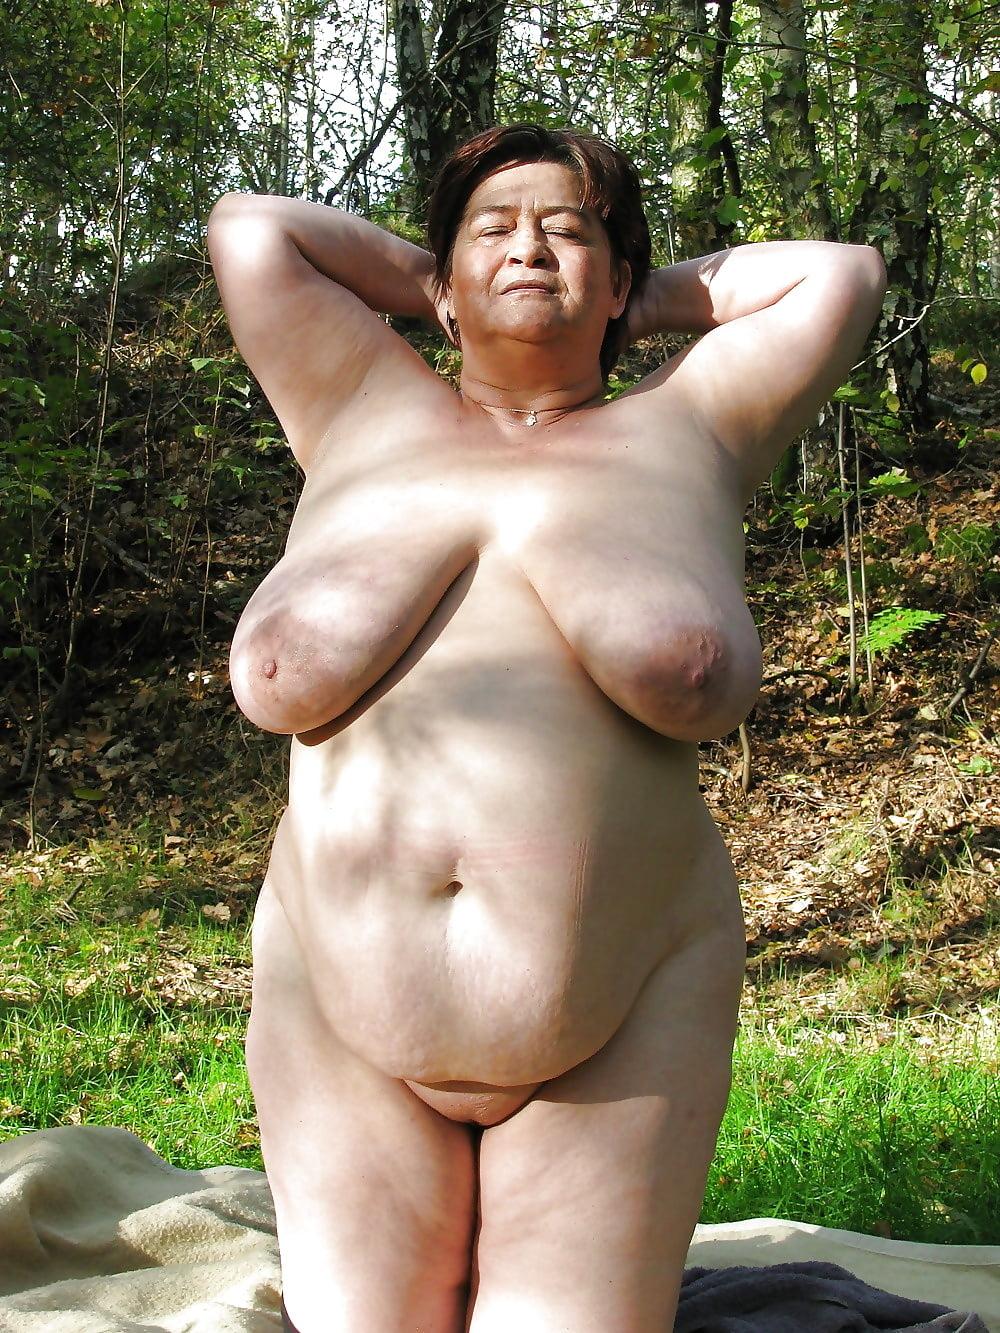 Granny nudists photos, japanese sex oon